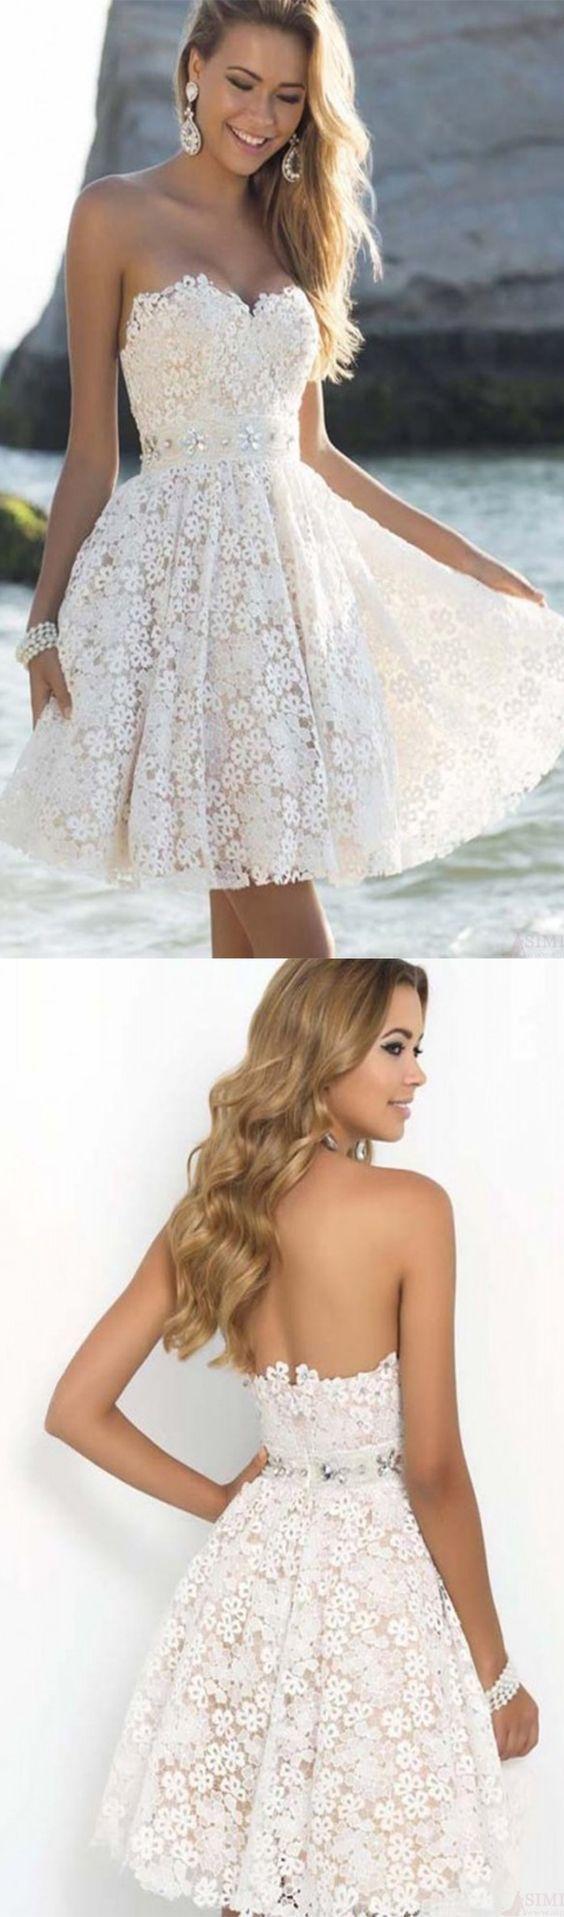 Short lace wedding dress homecoming dressshort prom dress